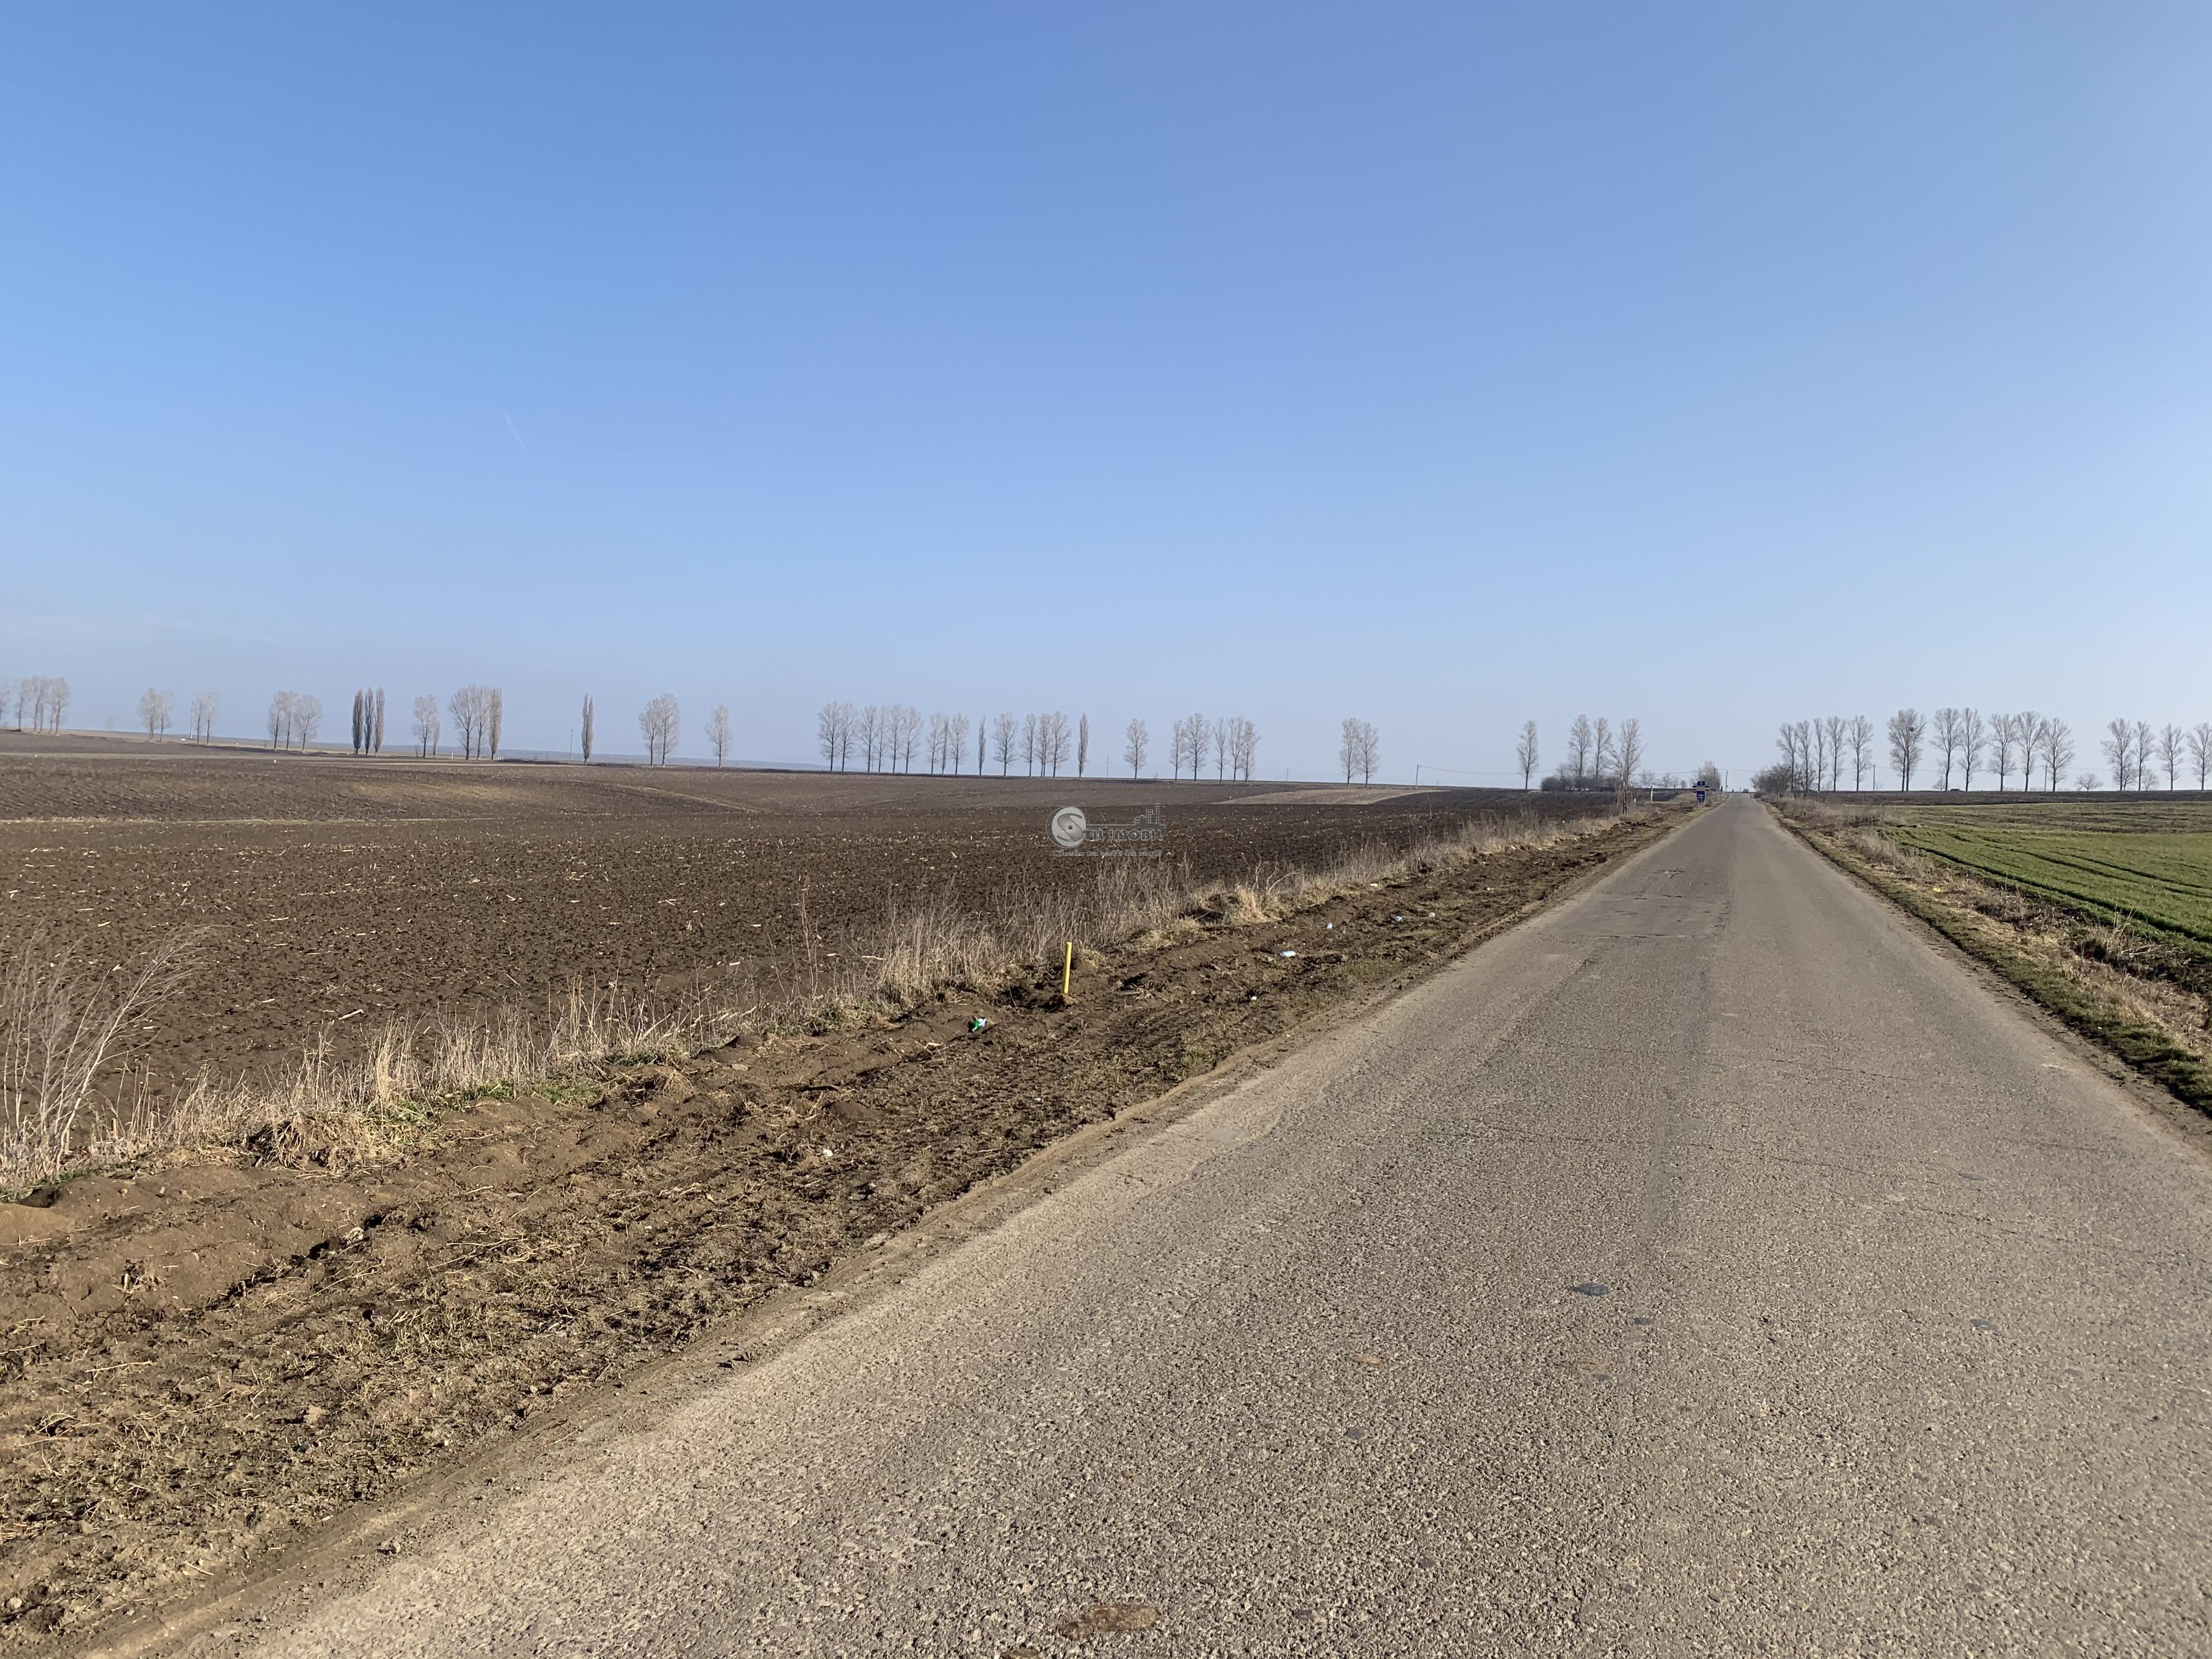 Teren V URSULUI-BOGDANESTI extravilan 10000 mp 39000 euro la asfalt